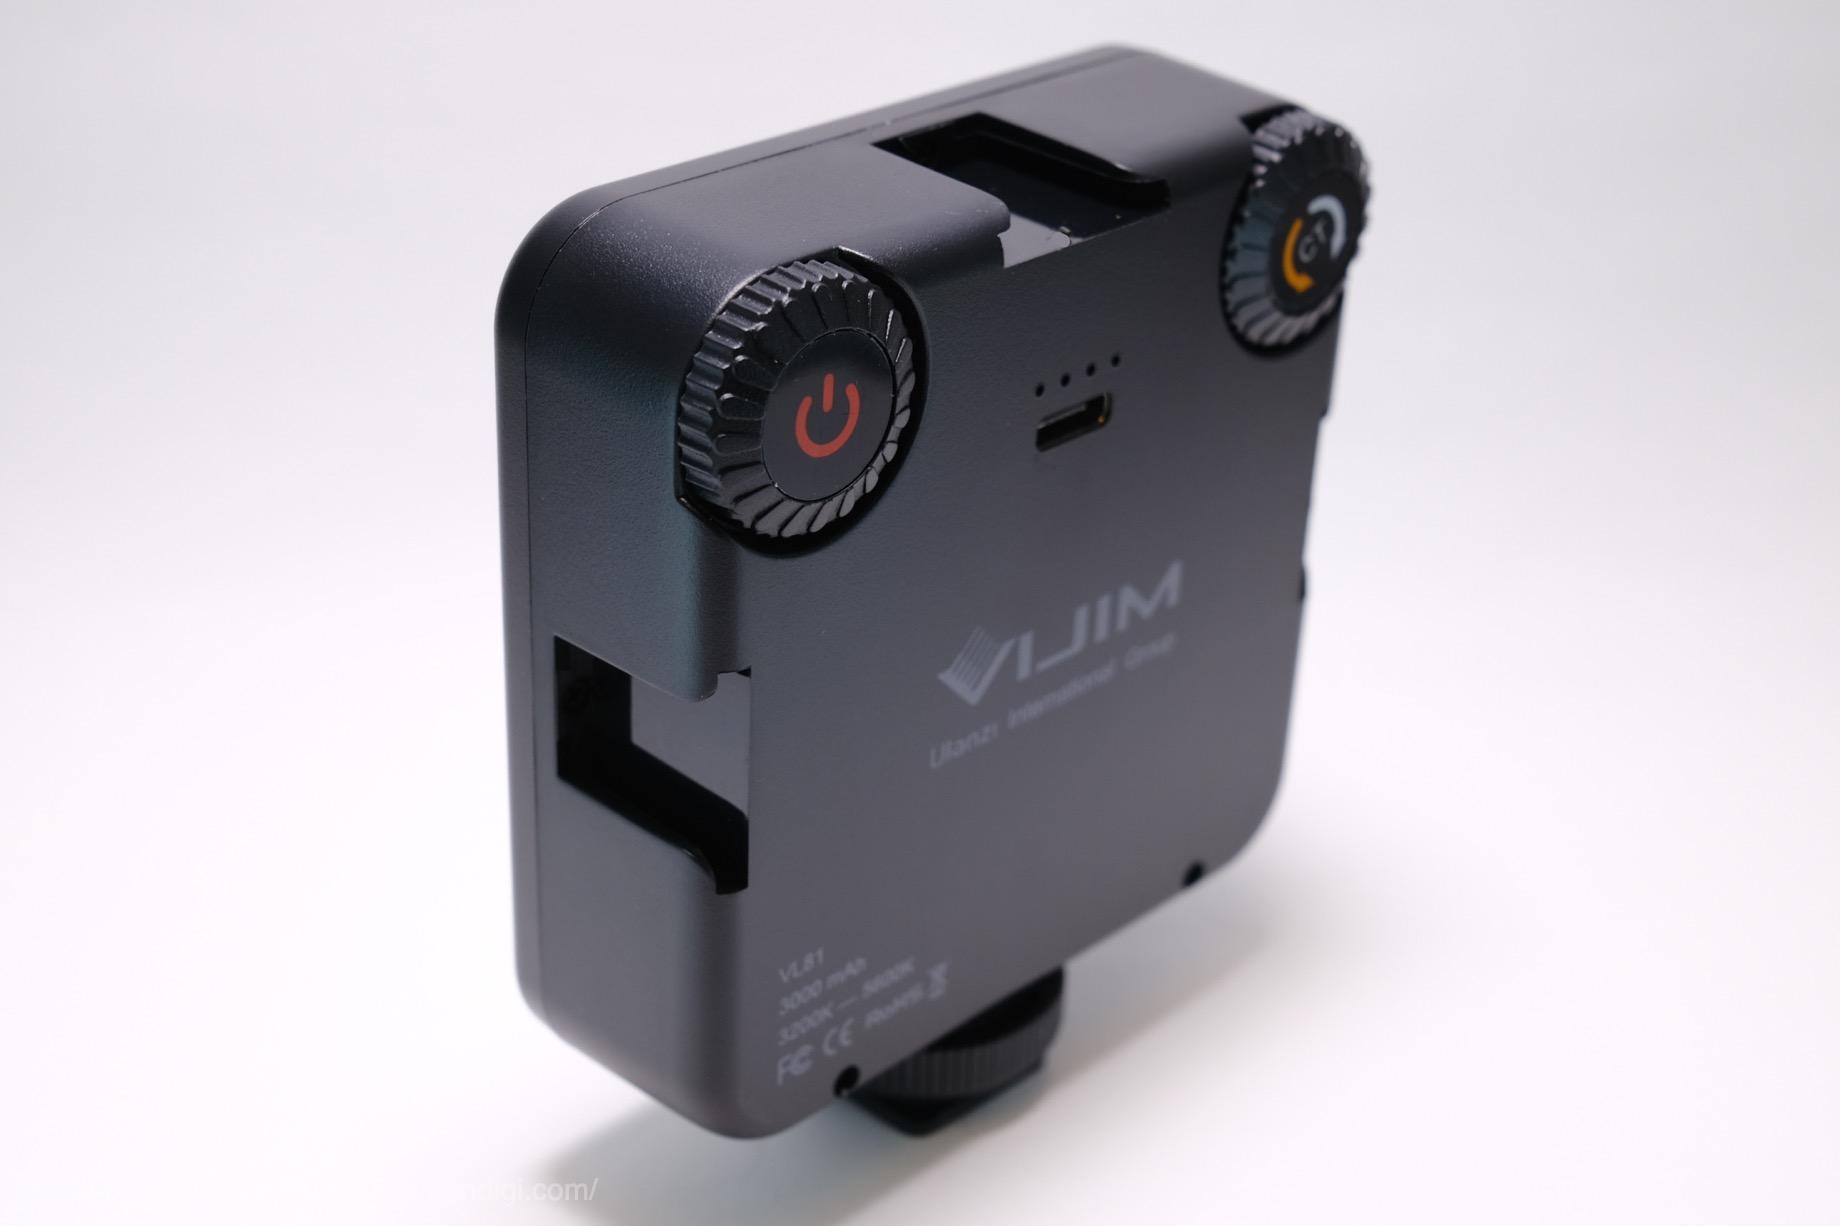 VIJIM VL81 LEDビデオライト